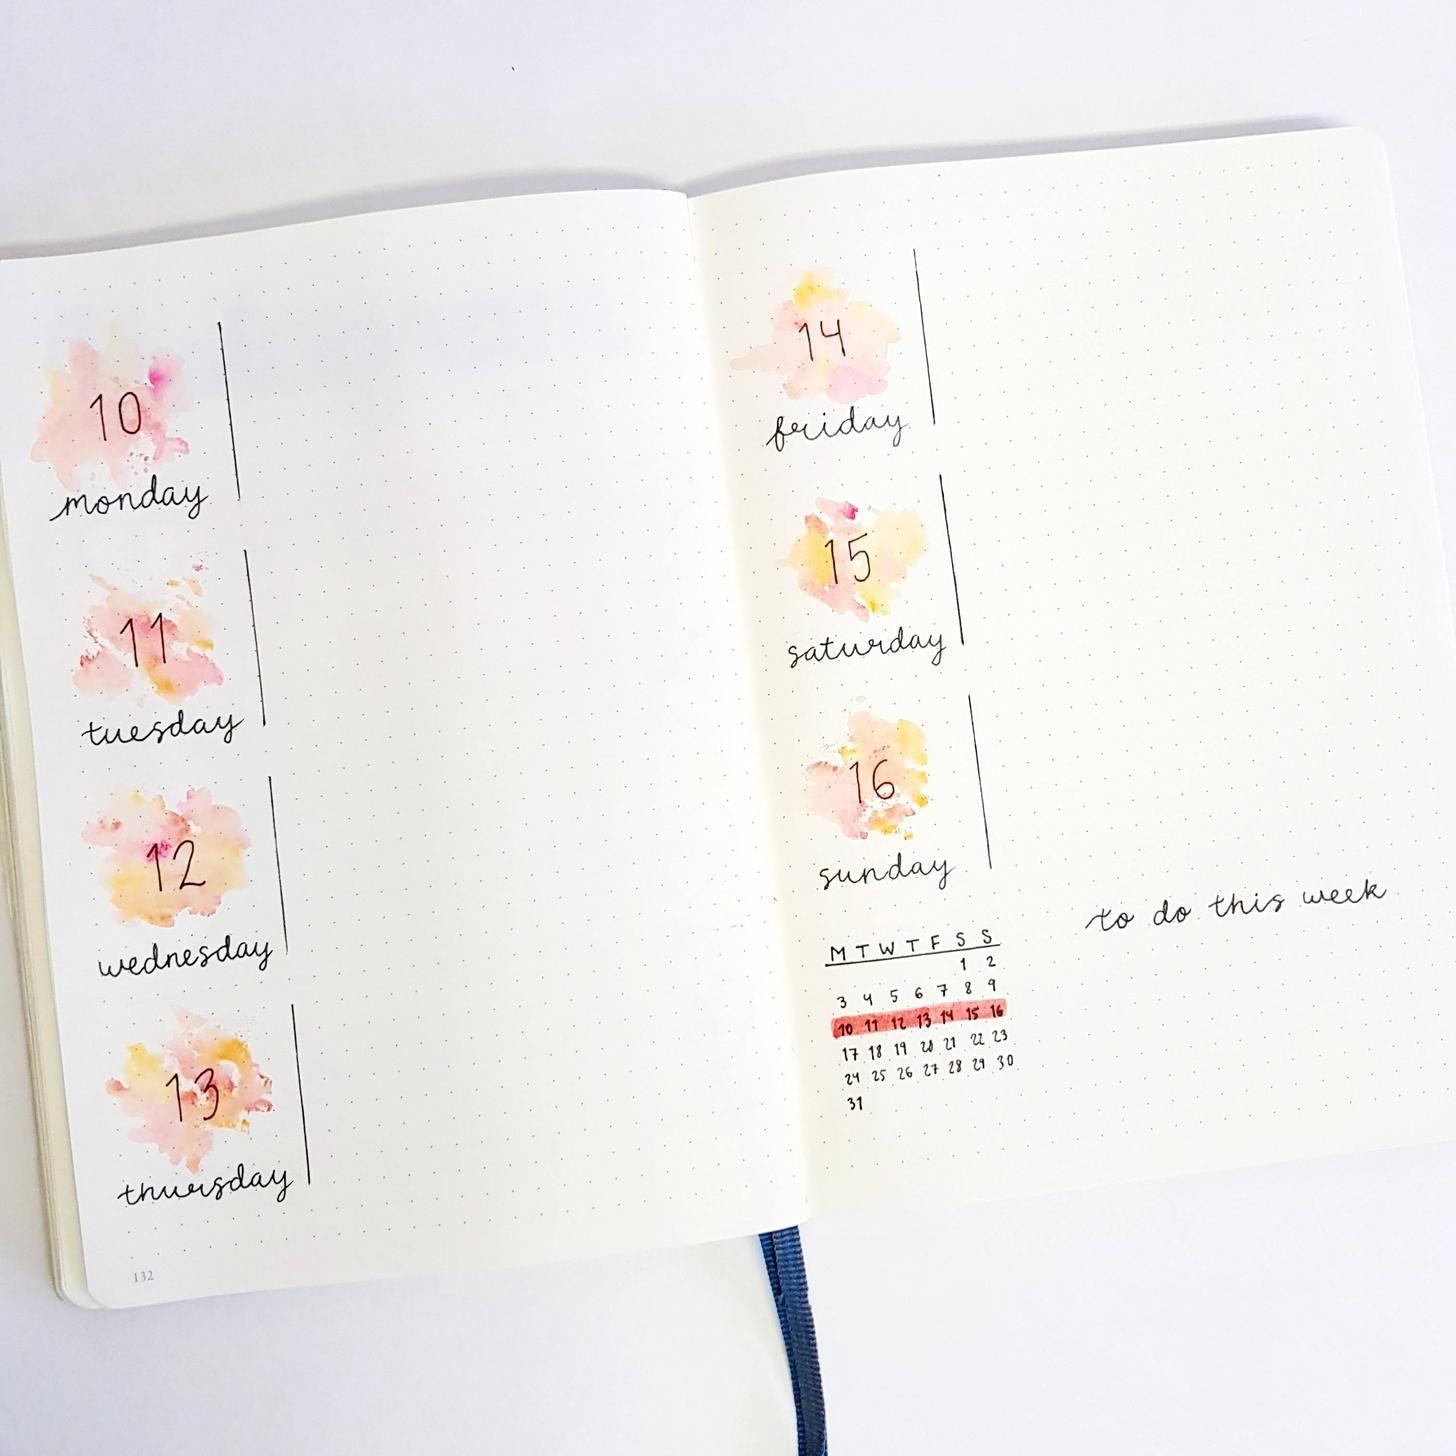 Last week's spread using Crayola supertips markers as watercolor - Album on Imgur #albumart